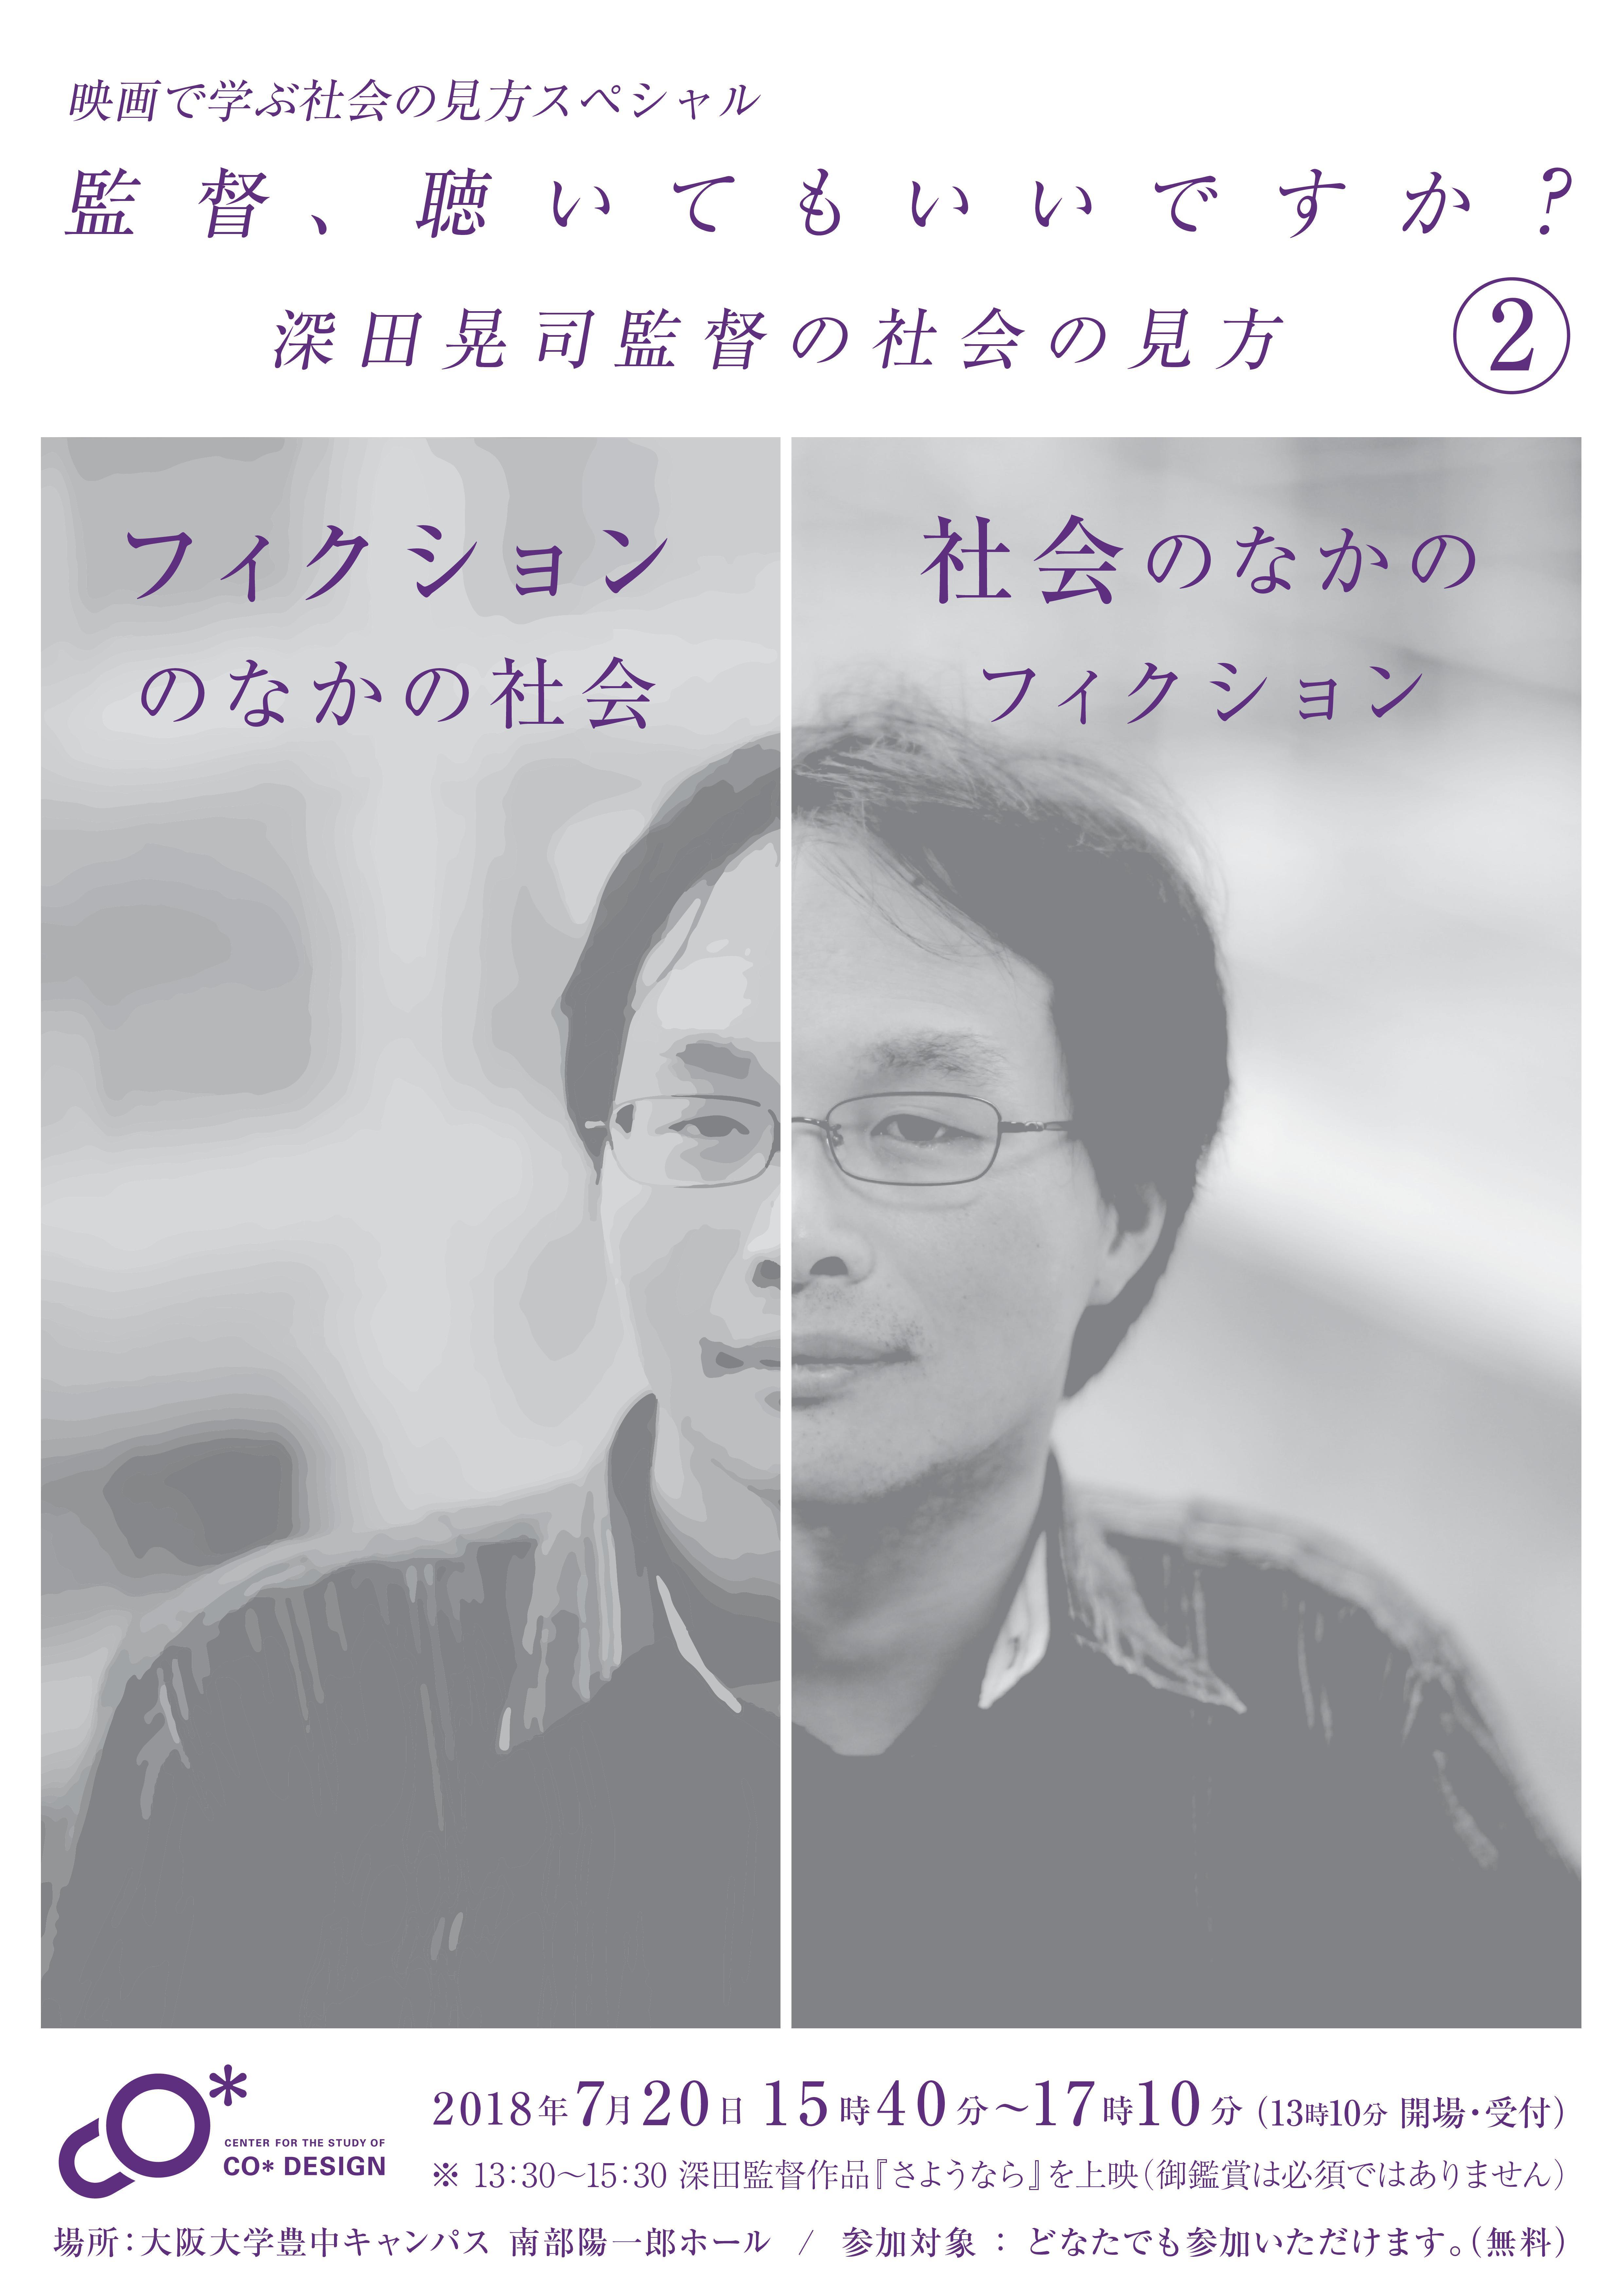 180720深田晃司監督チラシ表.jpg